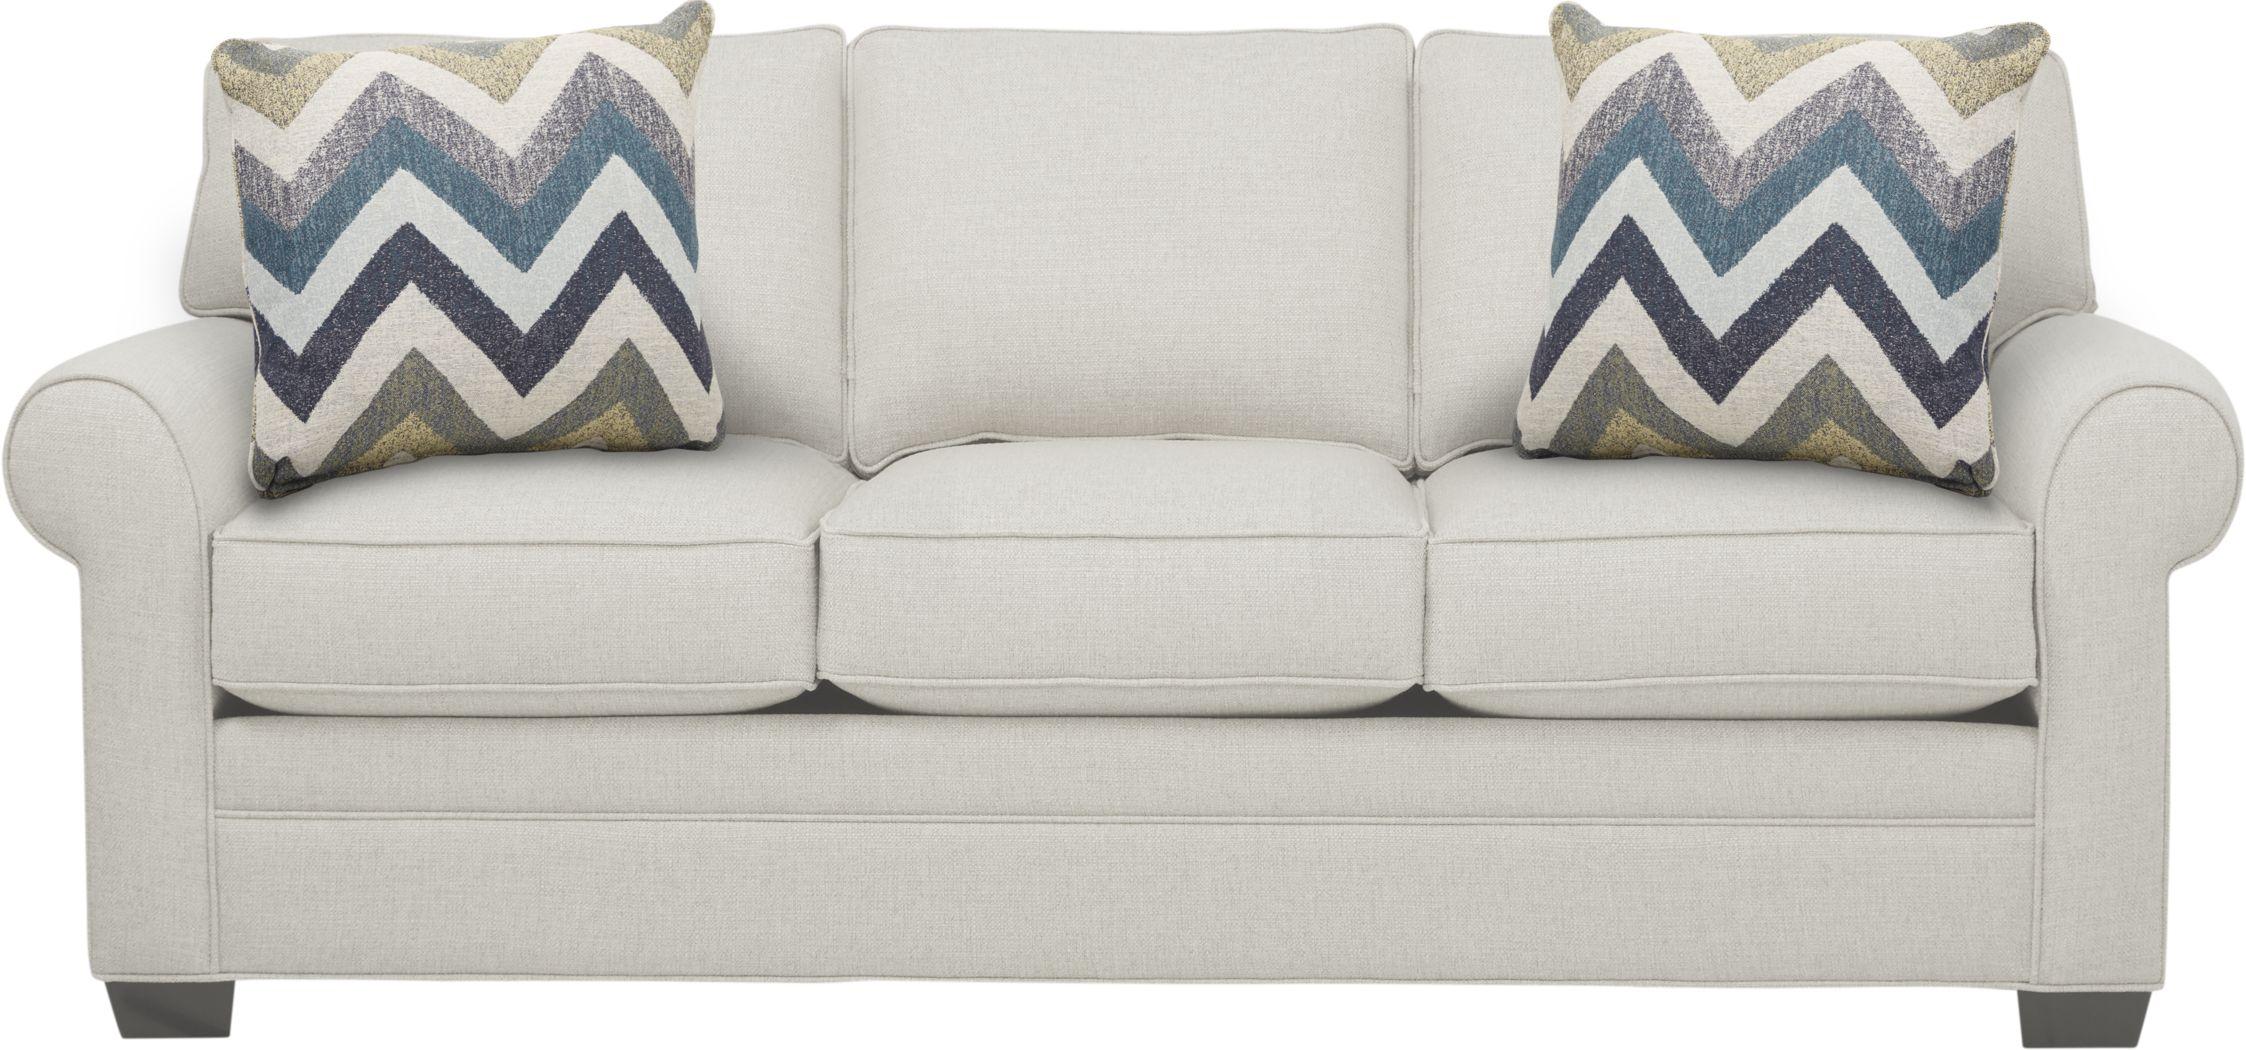 Cindy Crawford Home Bellingham Off-White Textured Gel Foam Sleeper